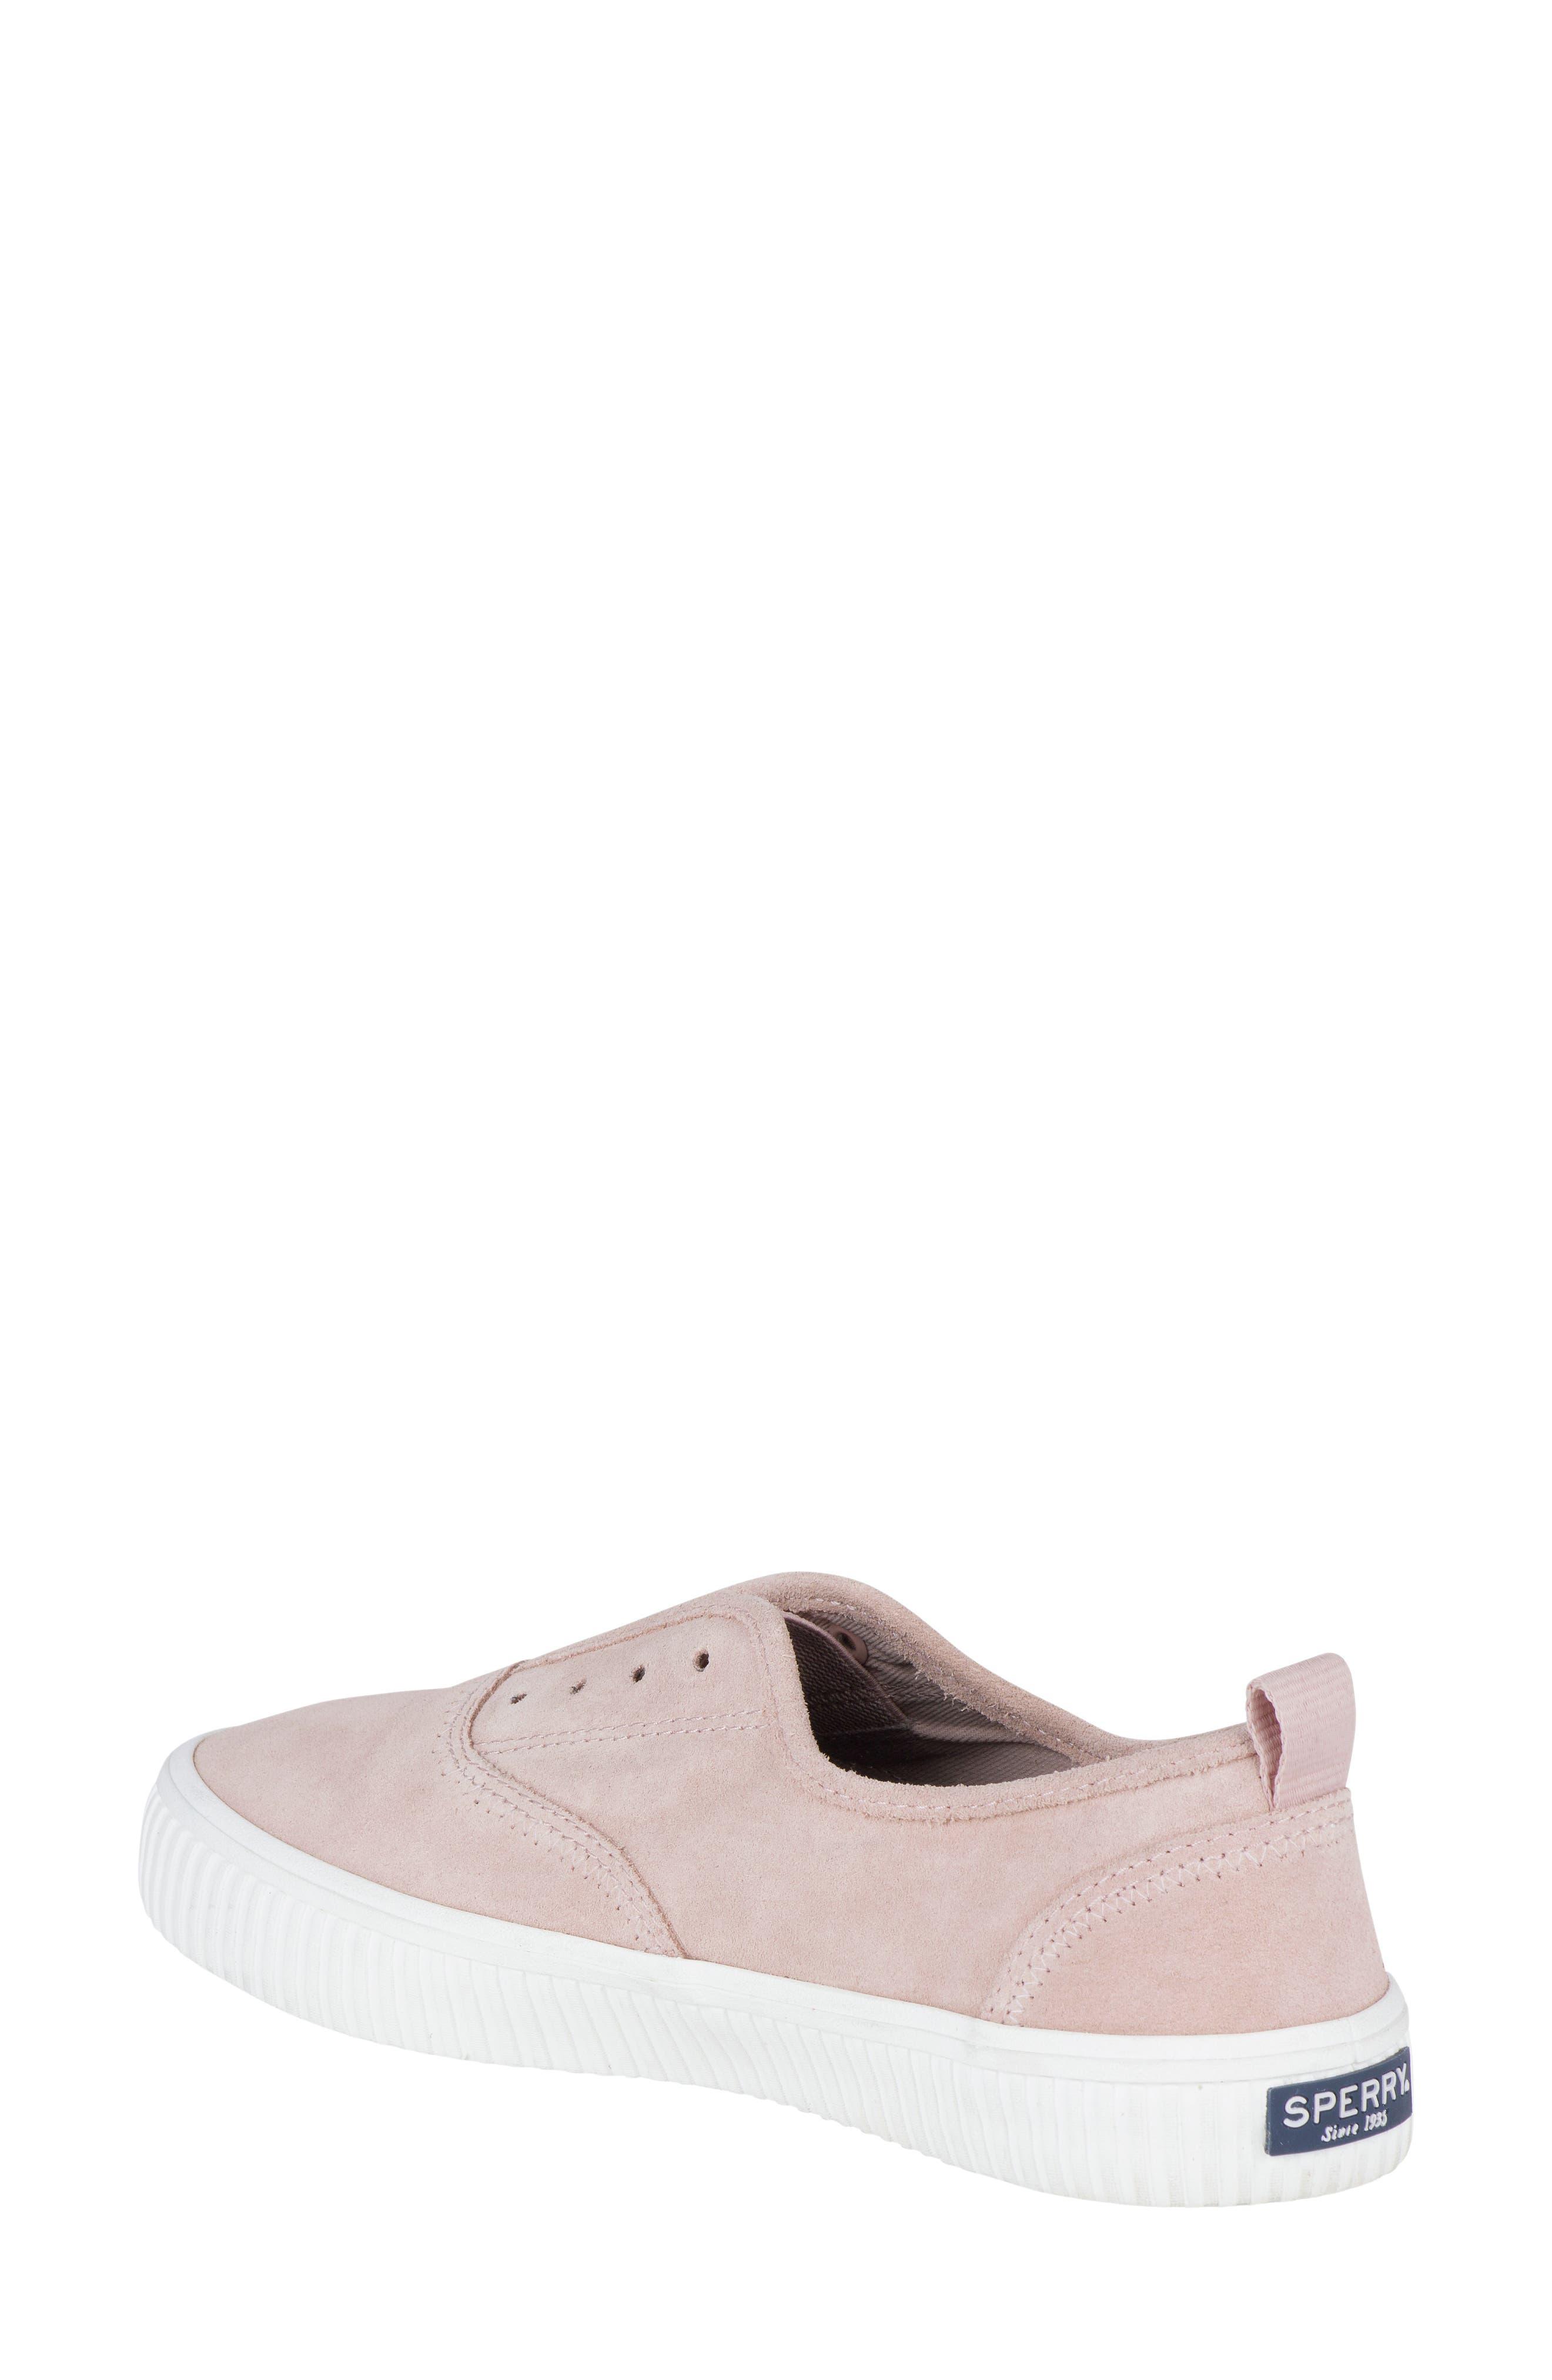 Crest Creeper Slip-On Sneaker,                             Alternate thumbnail 2, color,                             Rose Dust Suede